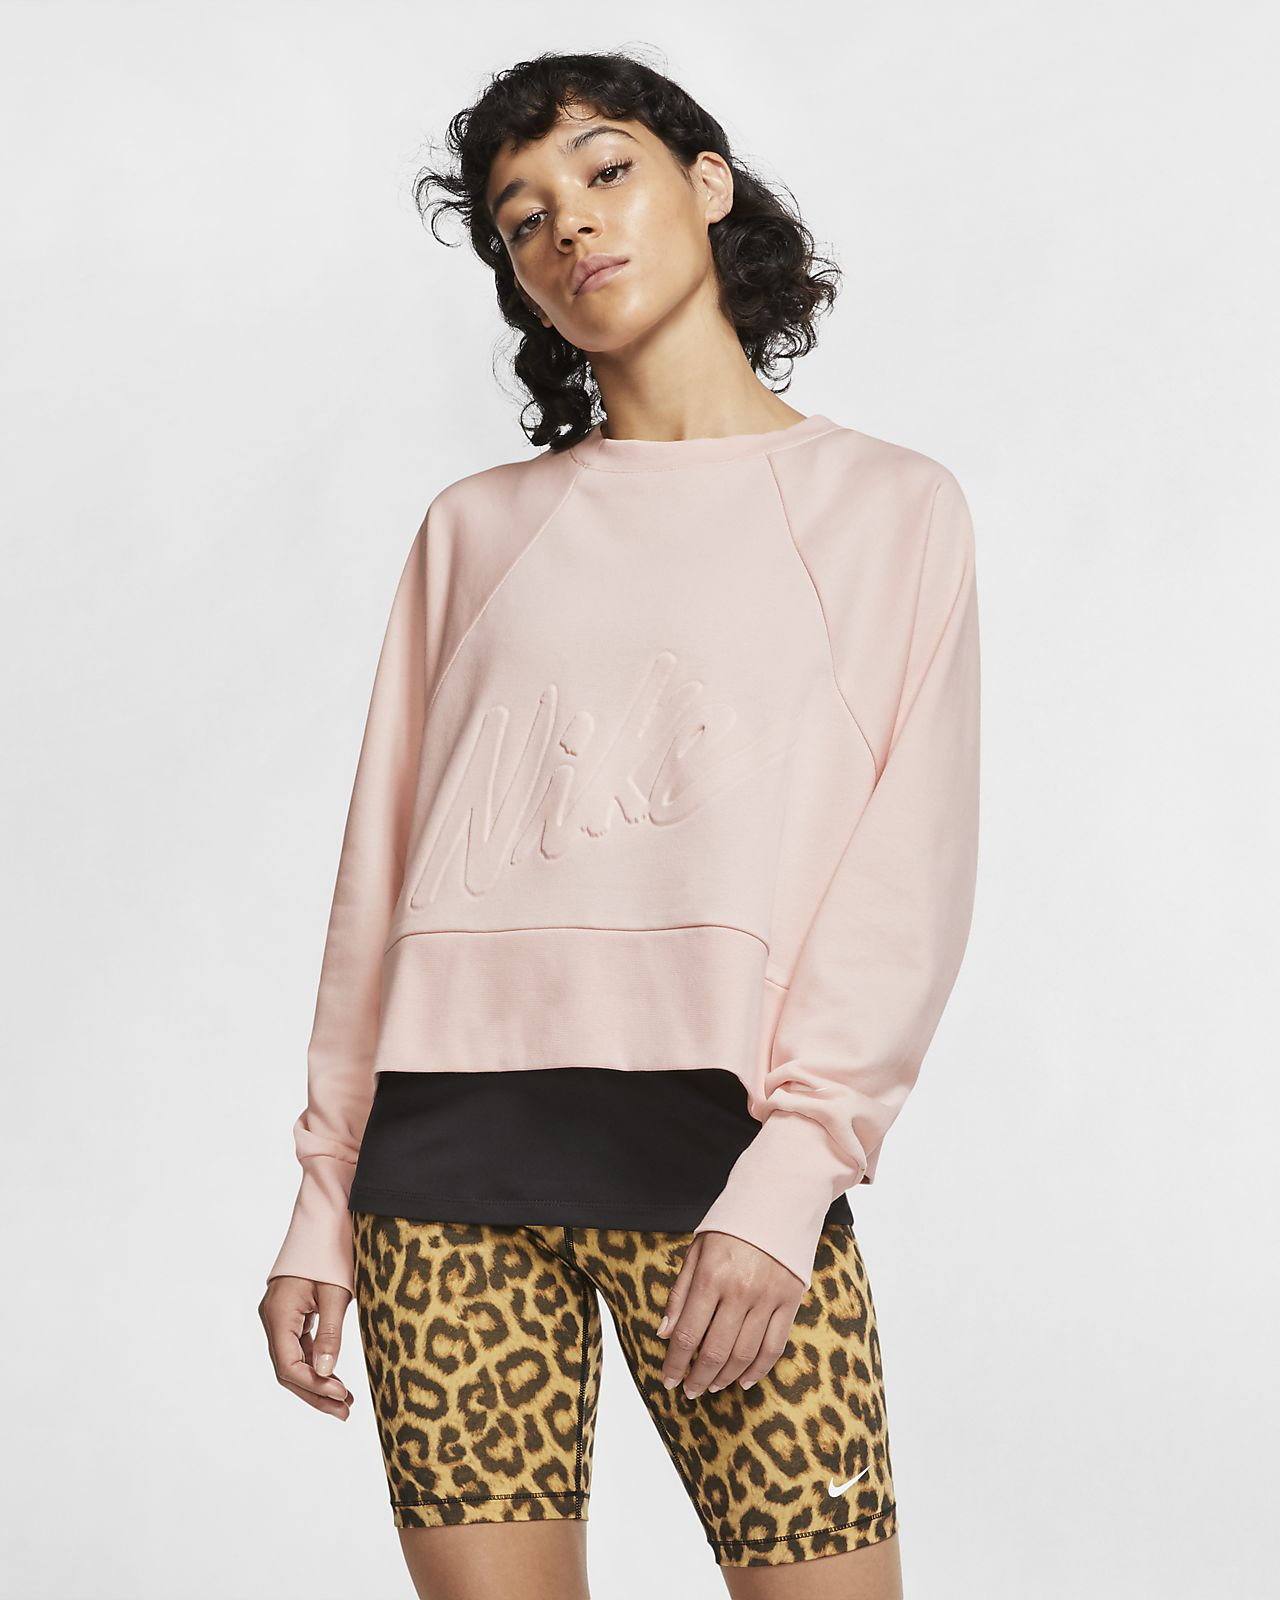 Nike Dri FIT Yellow Get Fit Fleece Crew Sweater